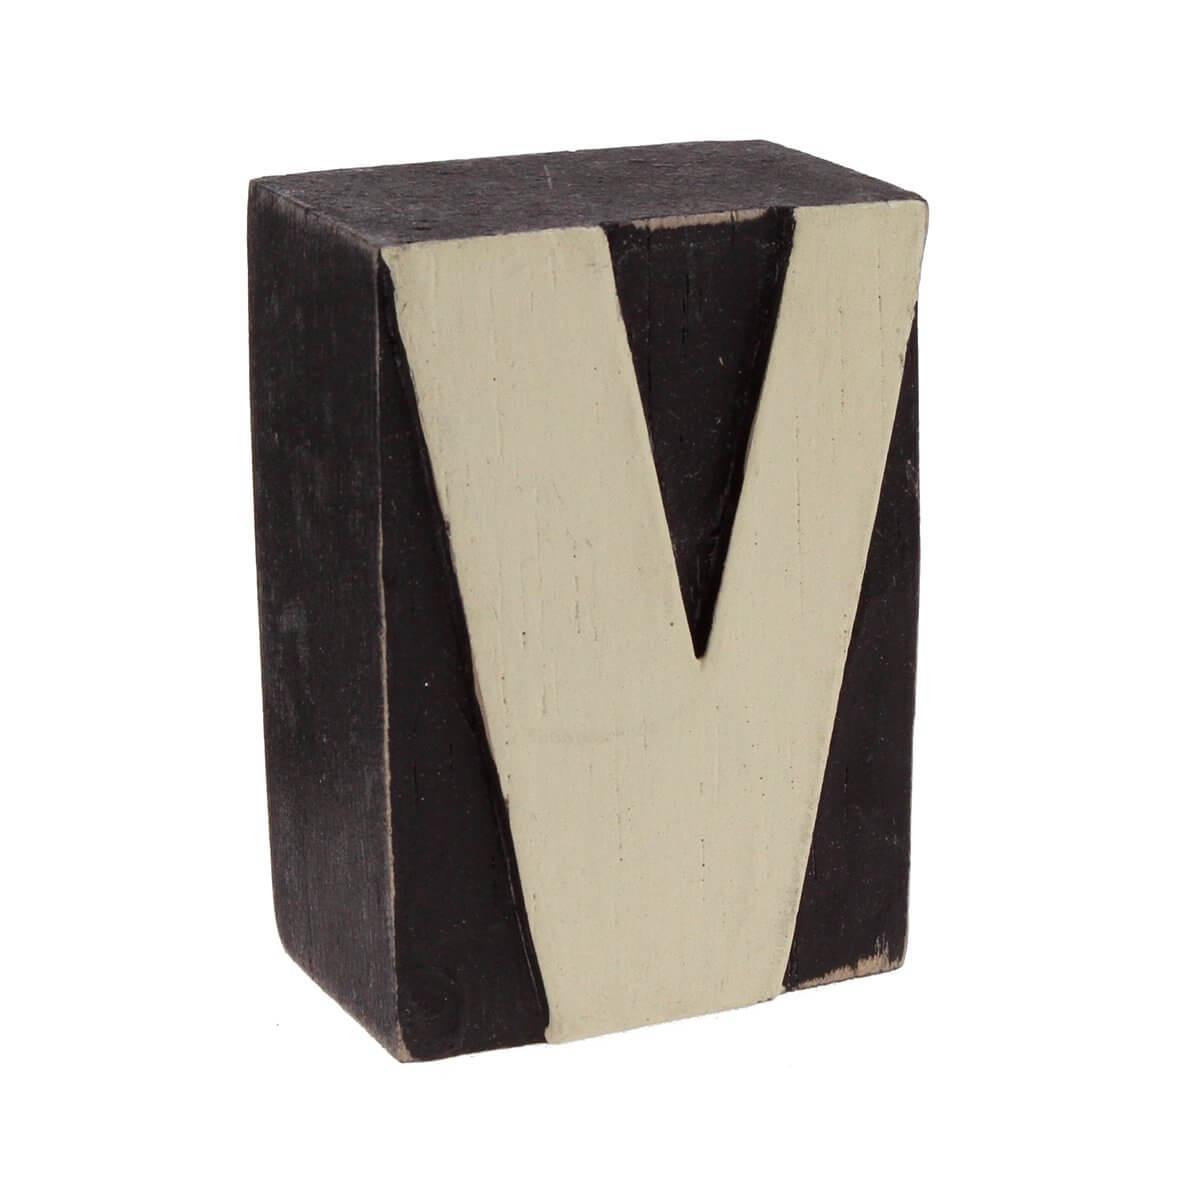 Wood block letter - V